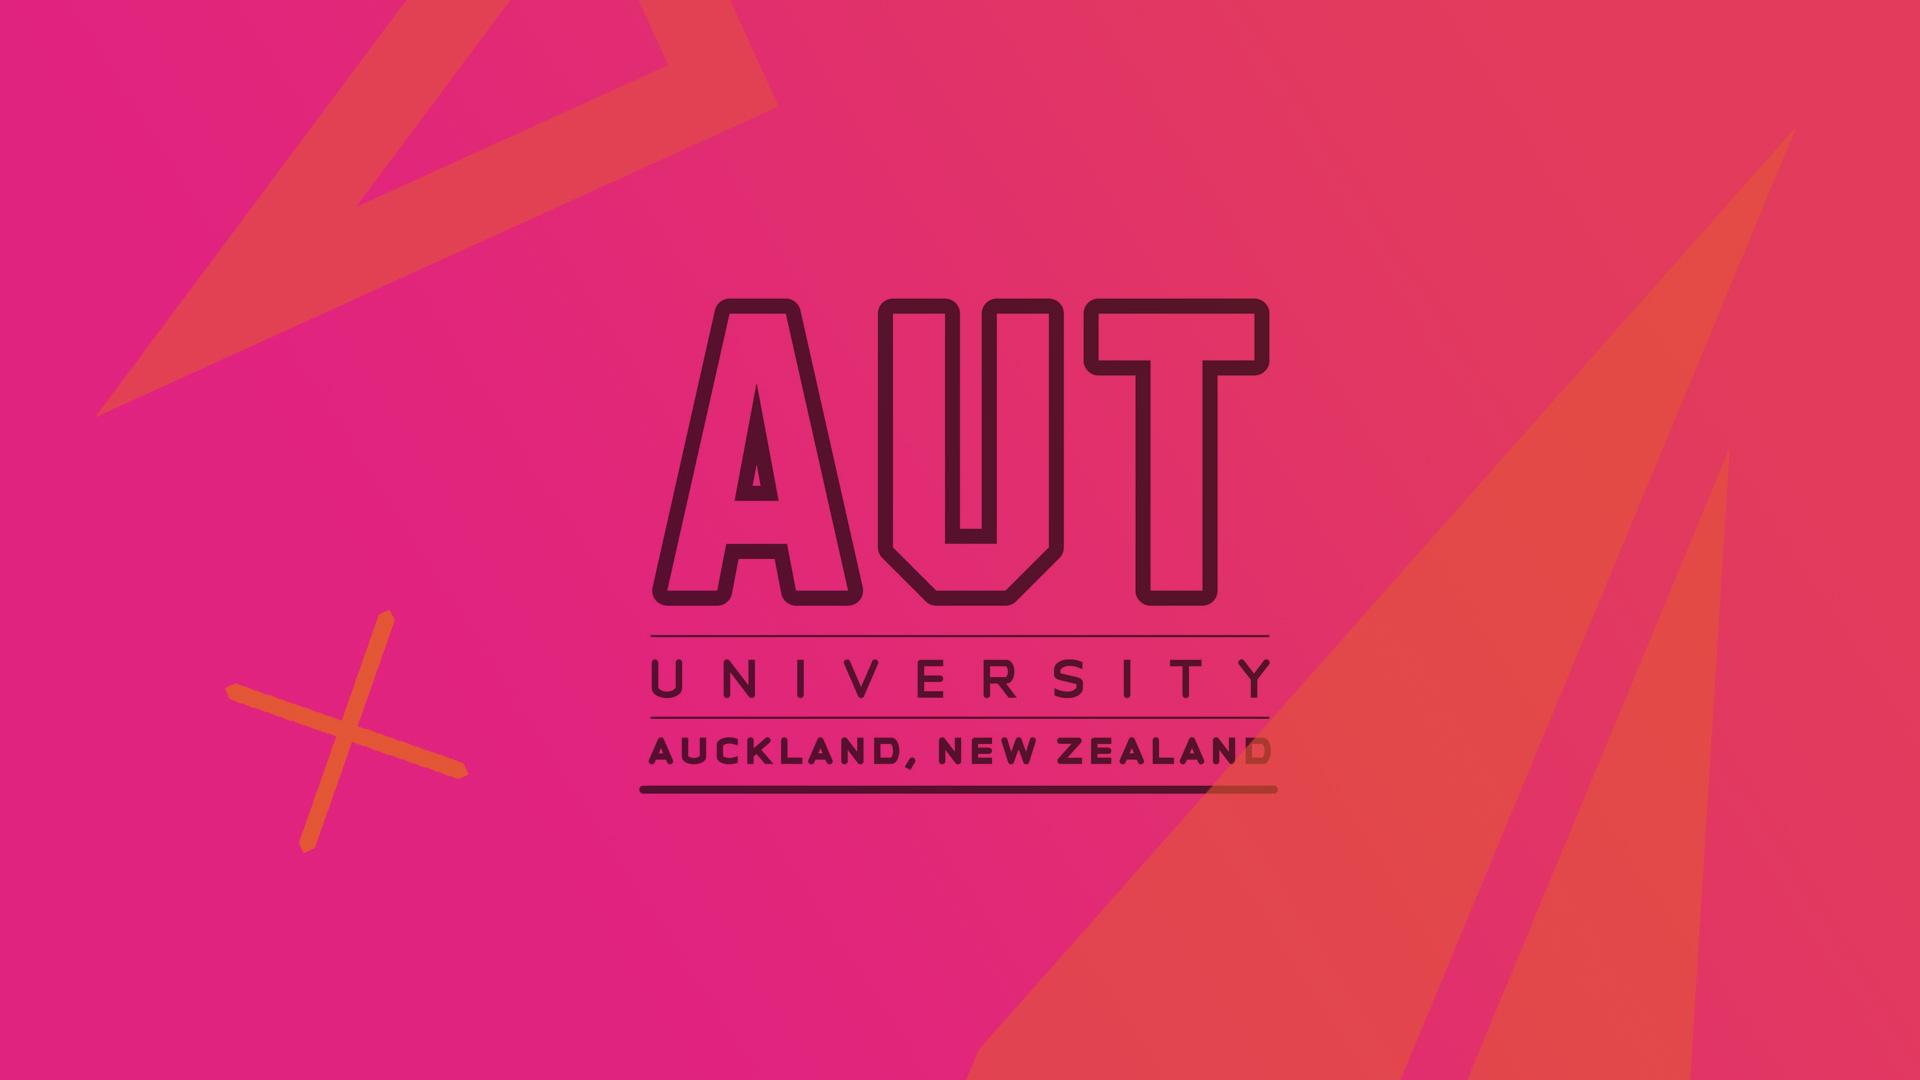 Ausbildung / education Auckland University of Technology